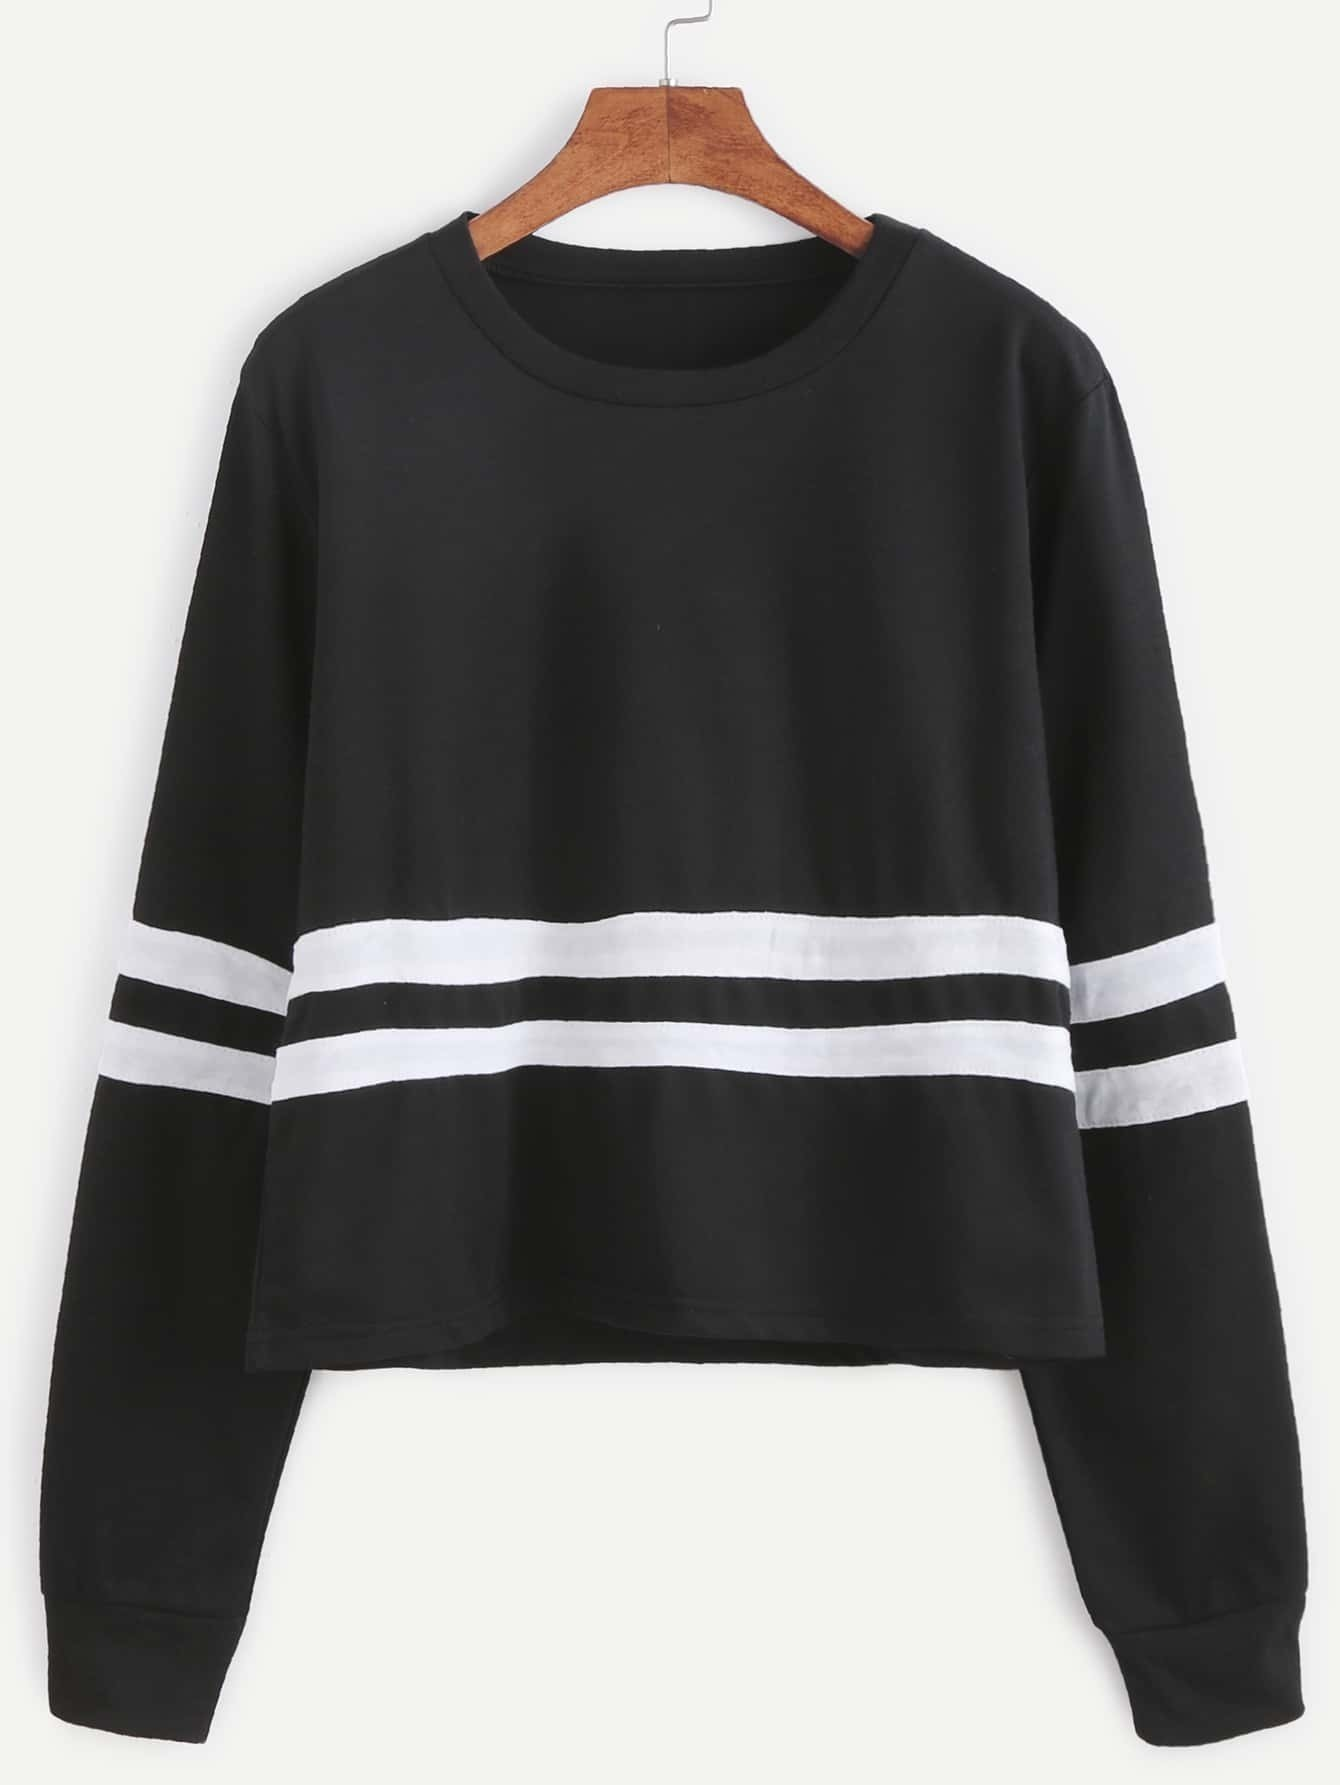 Black Striped Trim Sweatshirt sweatershirt161101101